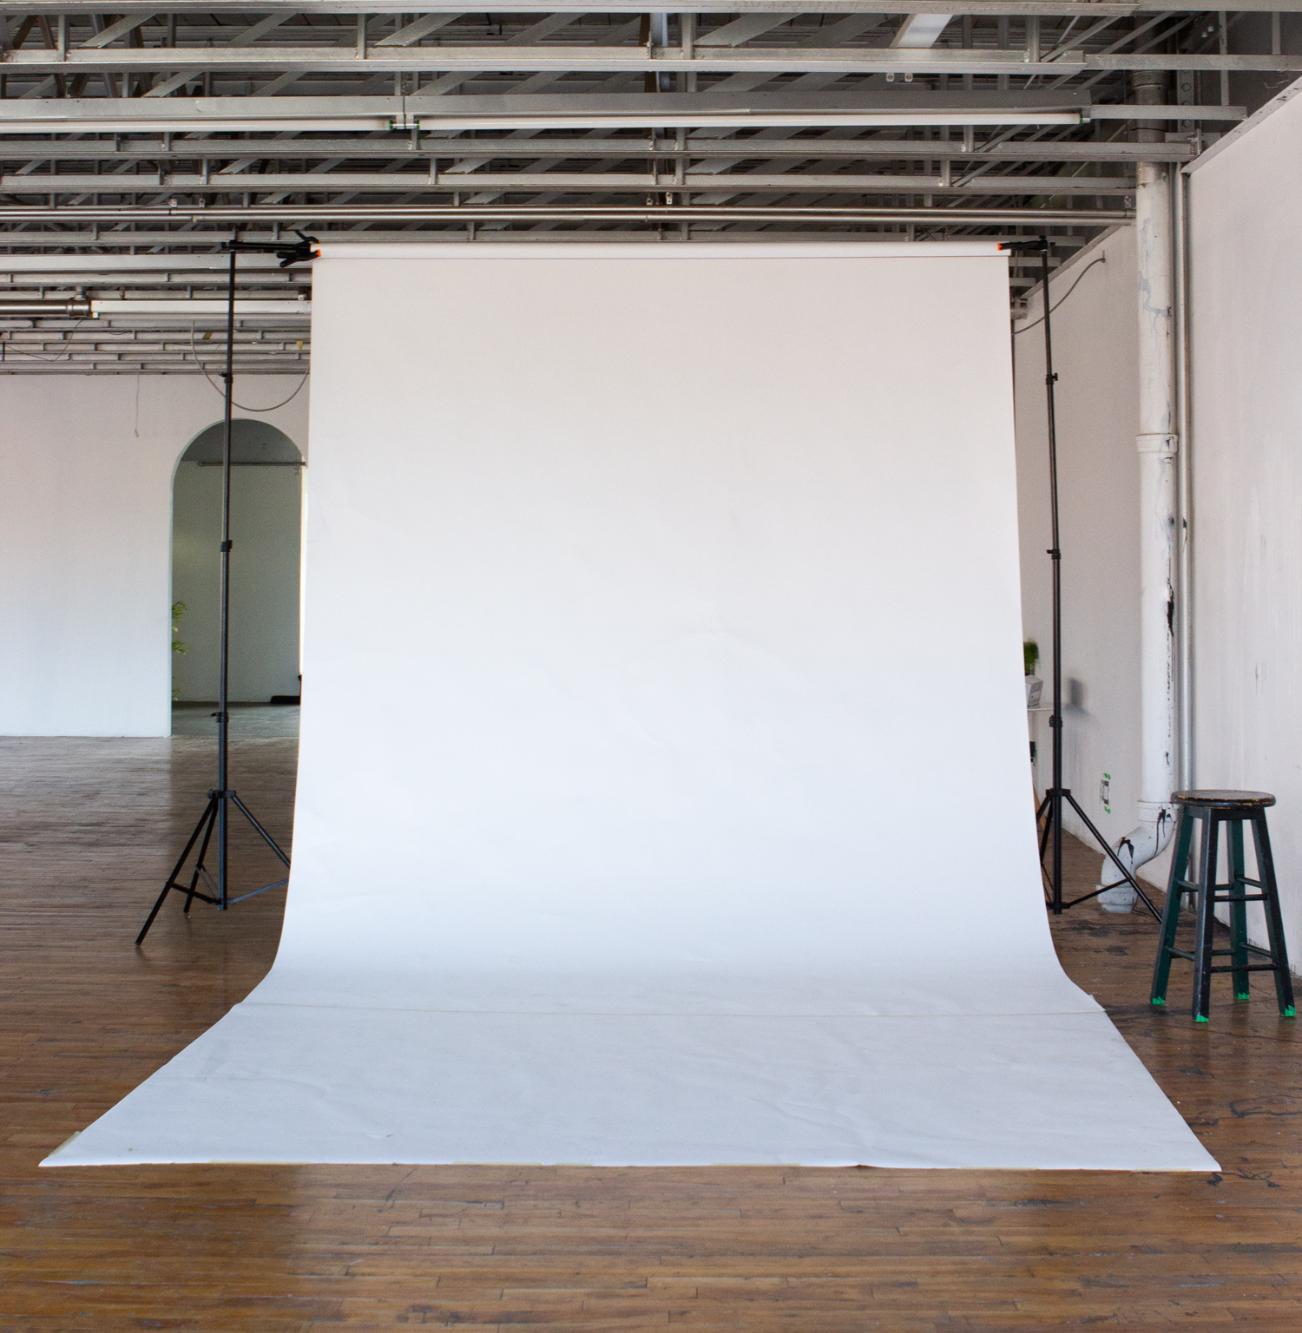 Rent the Photo studio, Production studio Montreal and Events rental Montreal.